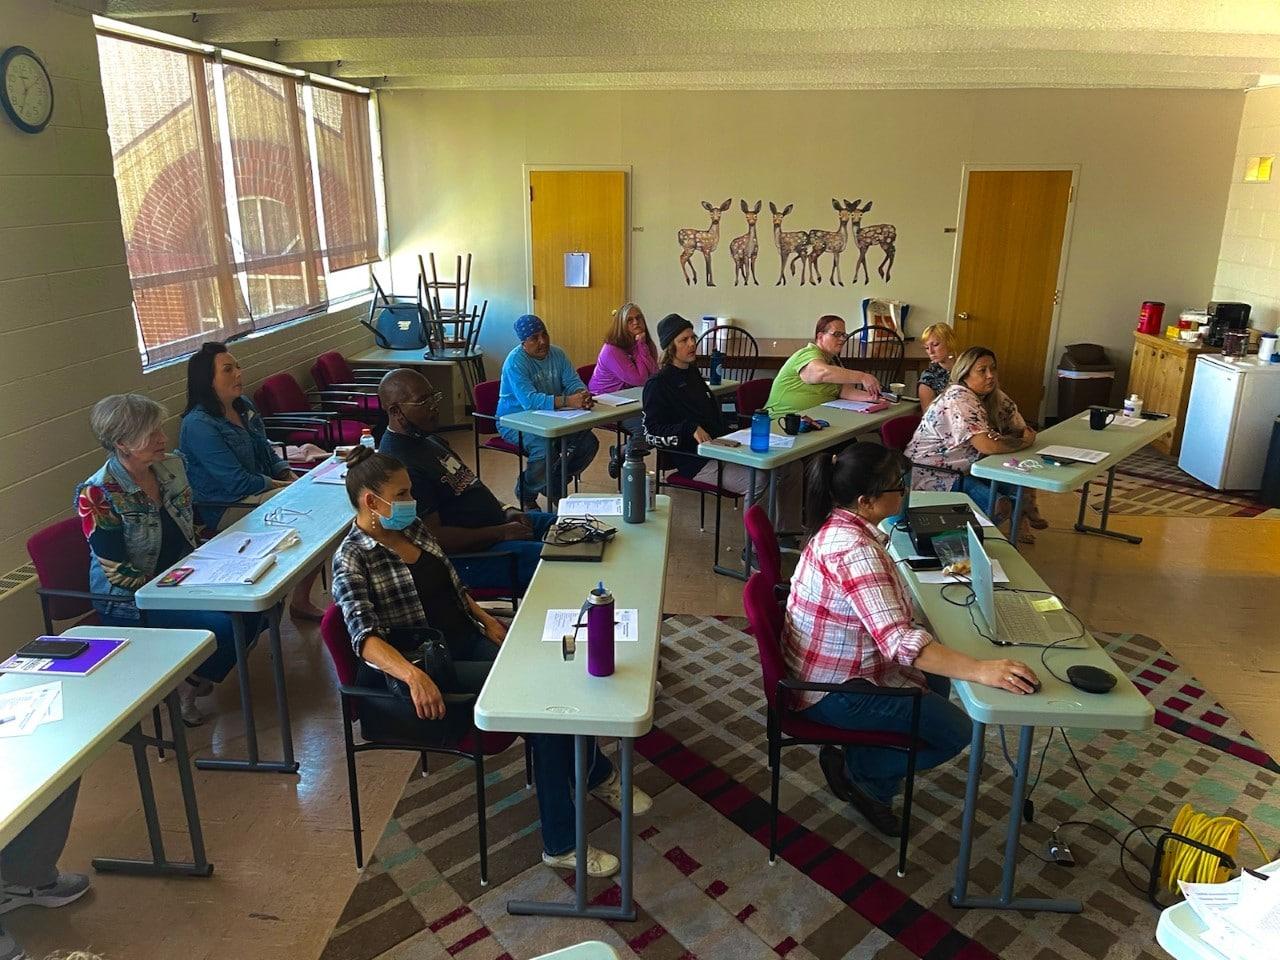 classroom full of people